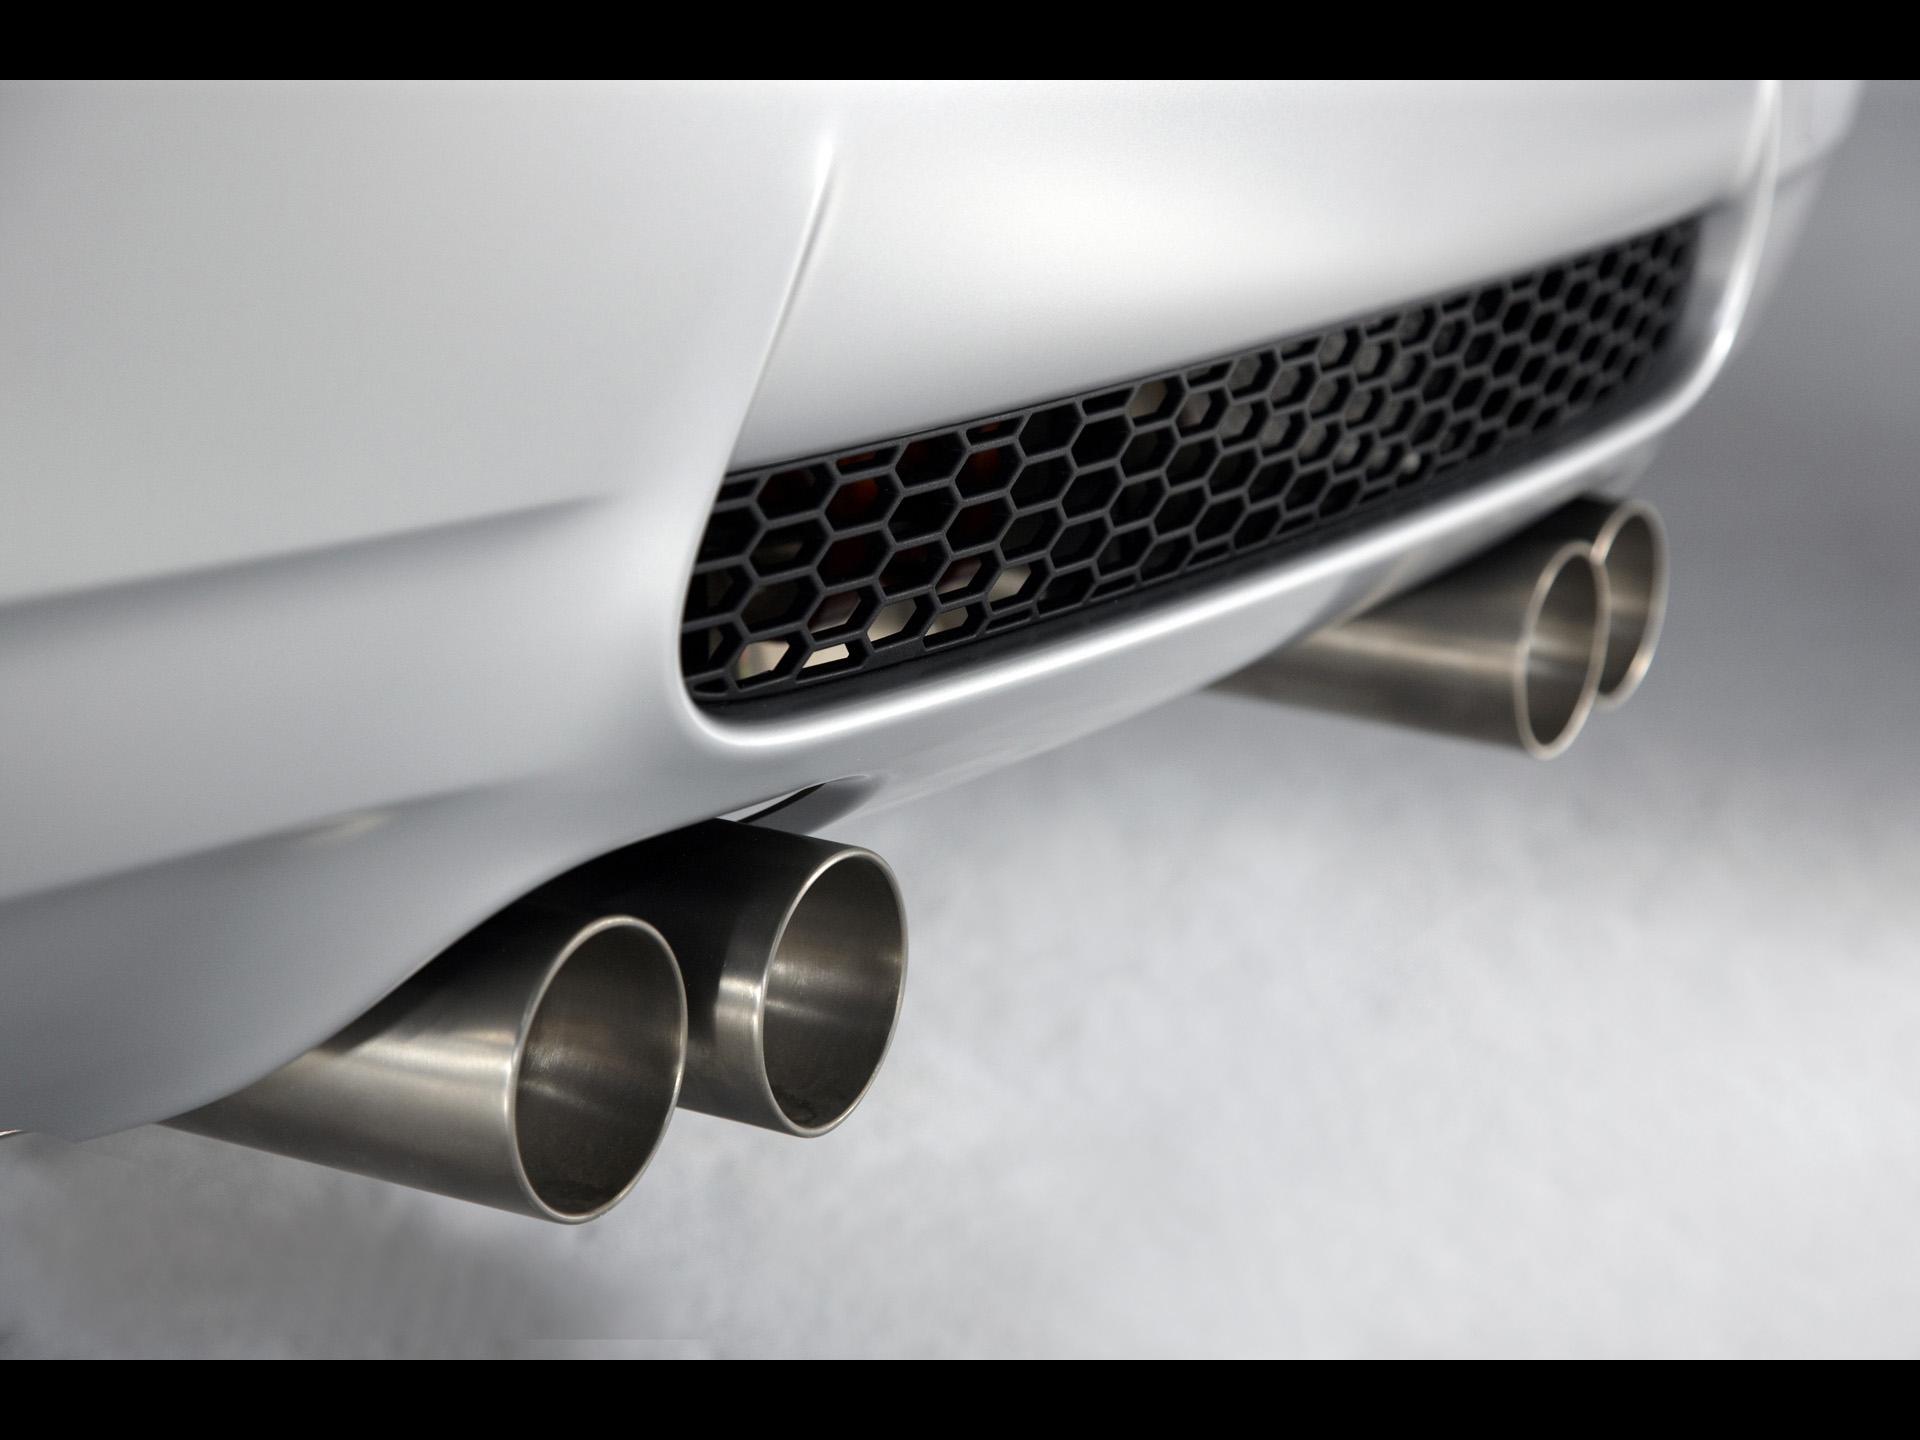 Car Air-conditioning